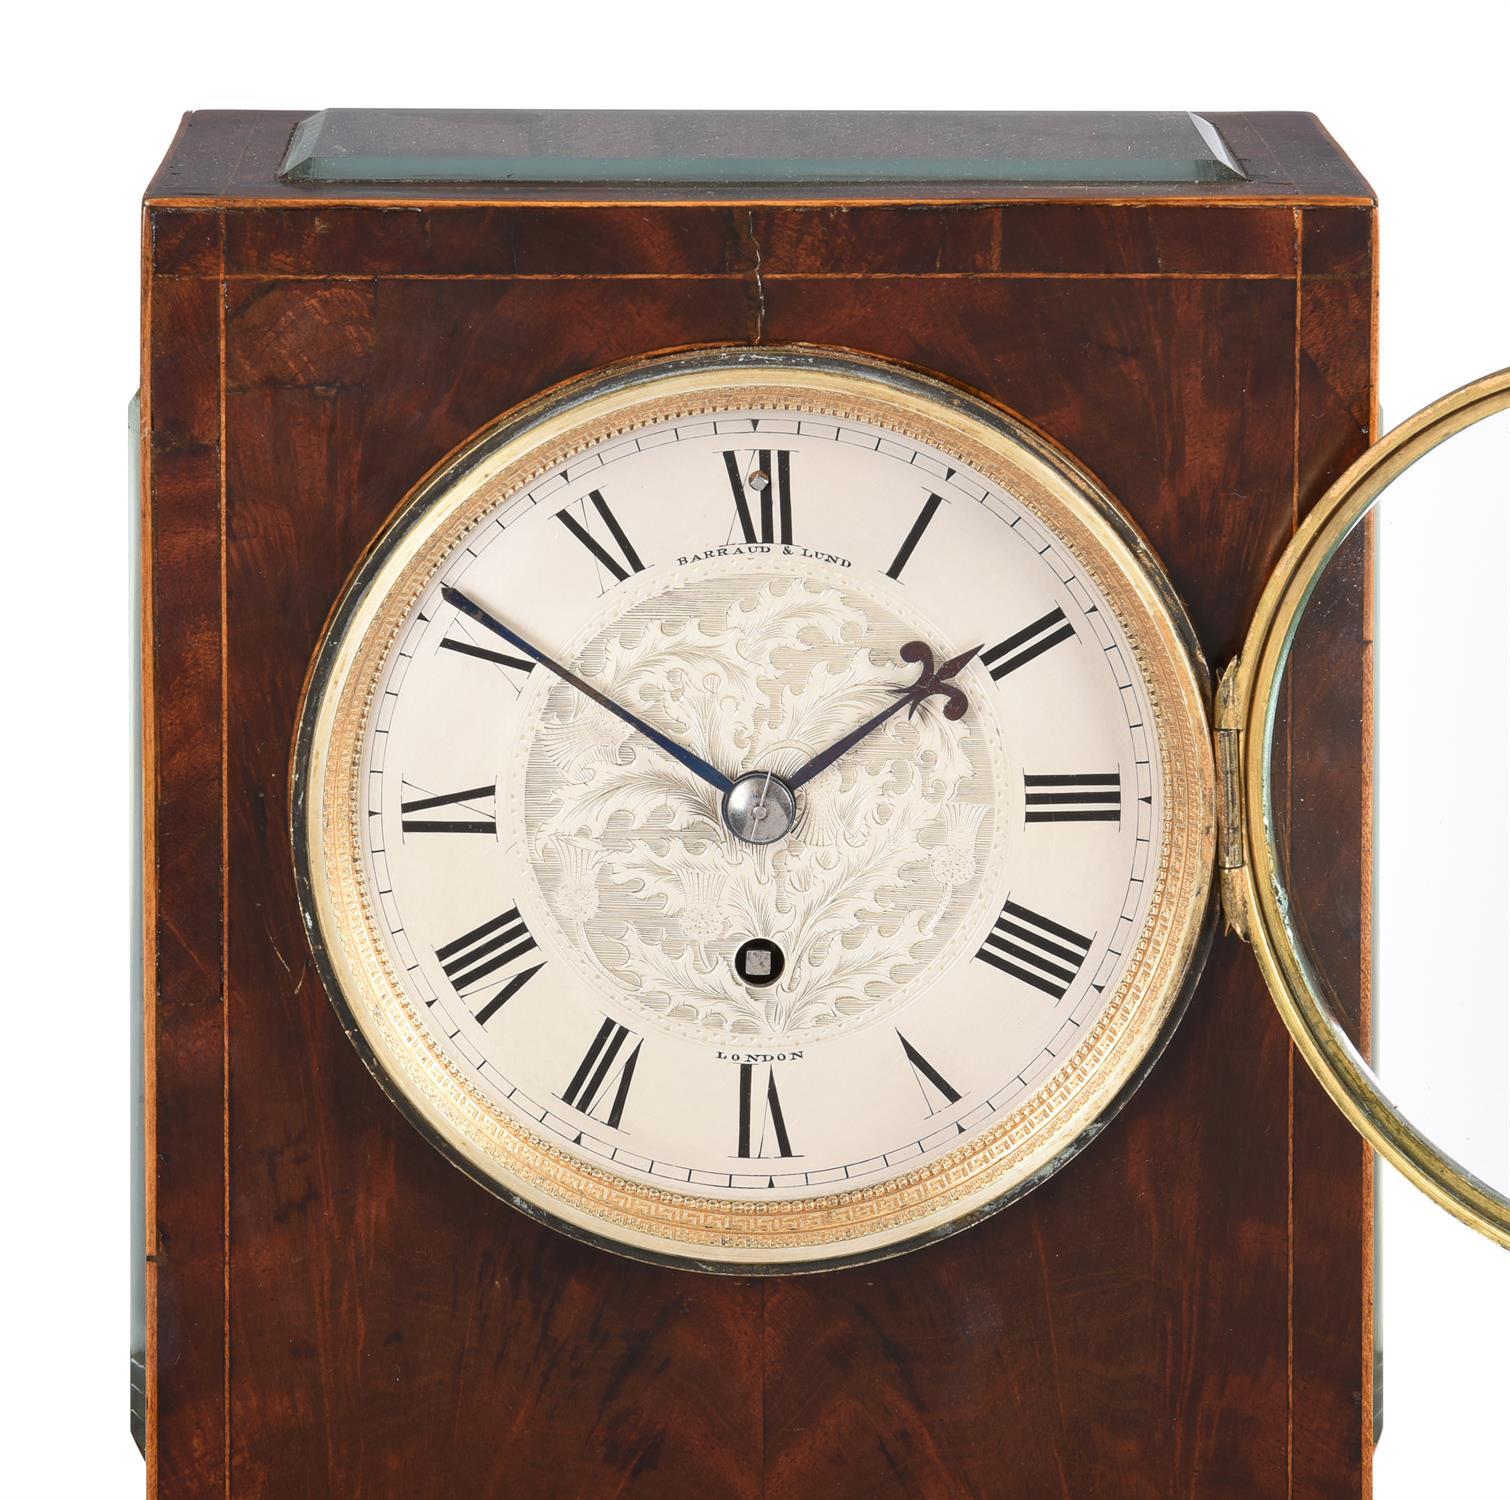 An inlaid mahogany mantel timepiece - Image 2 of 3